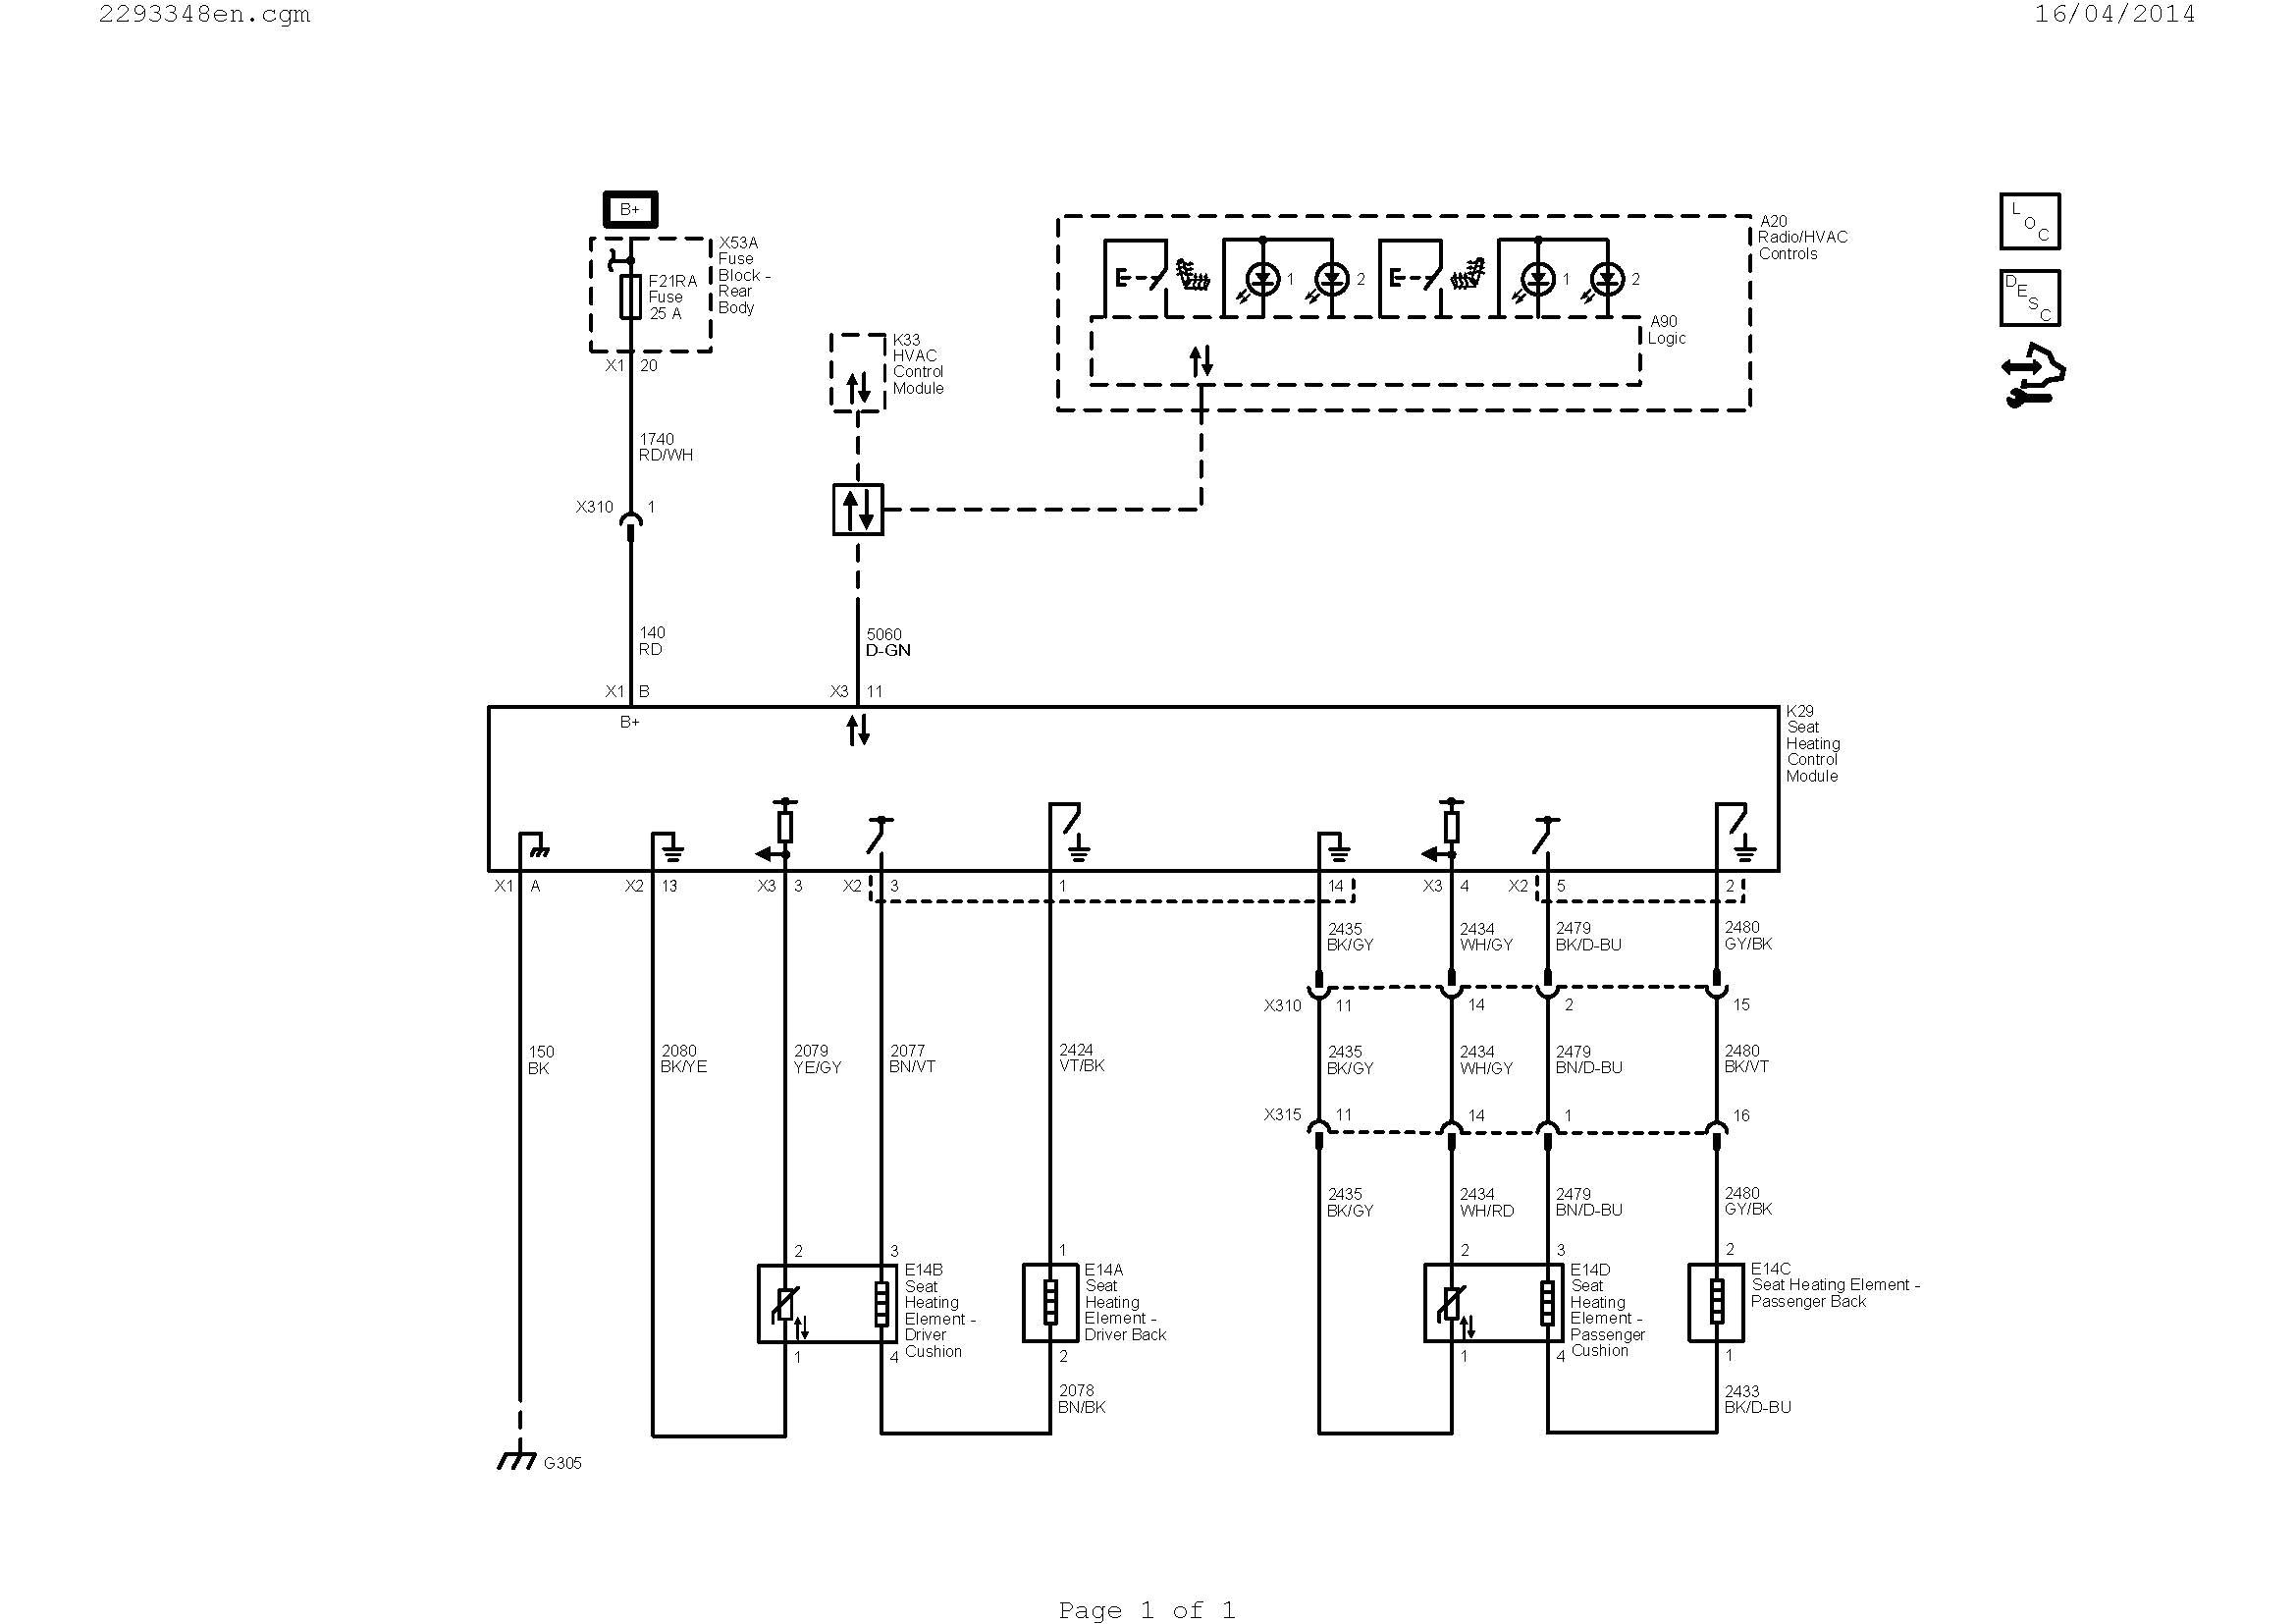 fbp 1 40x wiring diagram wiring diagram img fbp 1 40x wiring diagram fbp 1 40x wiring diagram